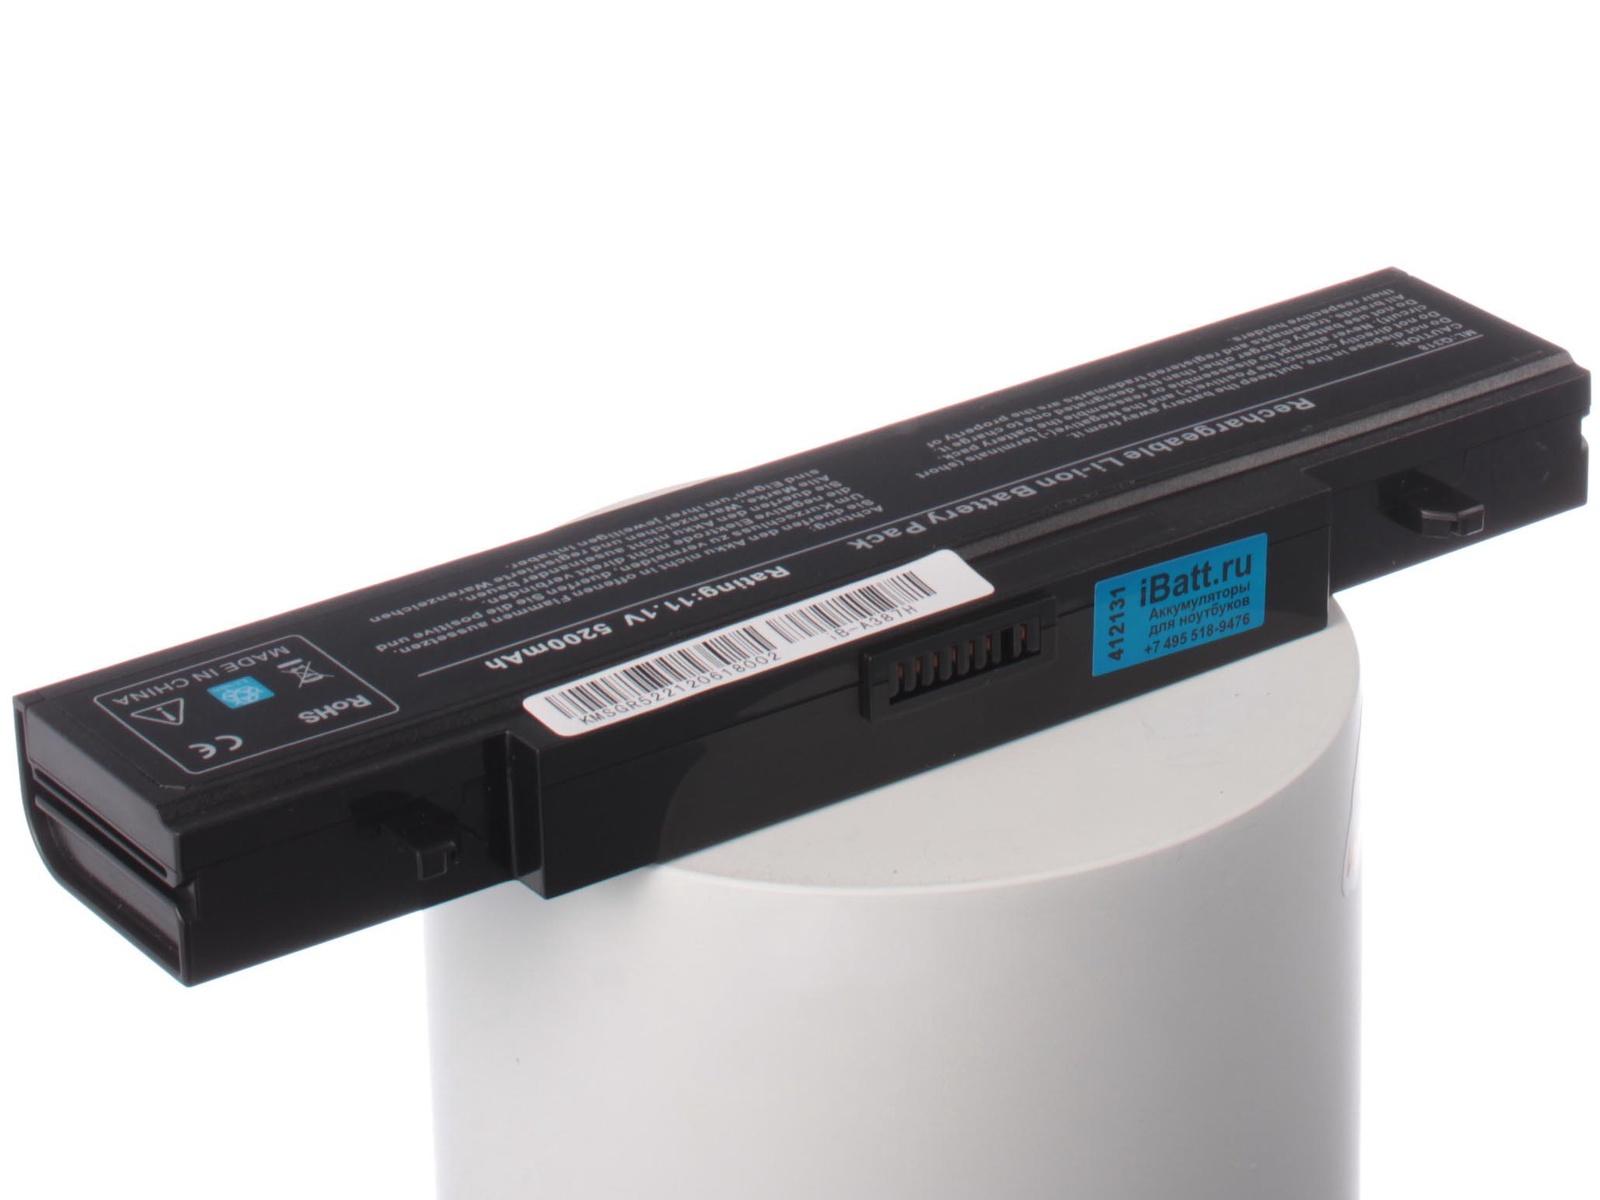 Аккумулятор для ноутбука iBatt для Samsung RV508-S01, R525-JS03, 270E5E-X05, 350E5C-S06, R540-JS0C, R540-JT04, 355E5X-S01, R525-JT09, 300E7A-S07, Samsung 355V5X, 300E7Z-S01, NP305V4A, RC528, RV510-S01, NP-R463, R528-DA03